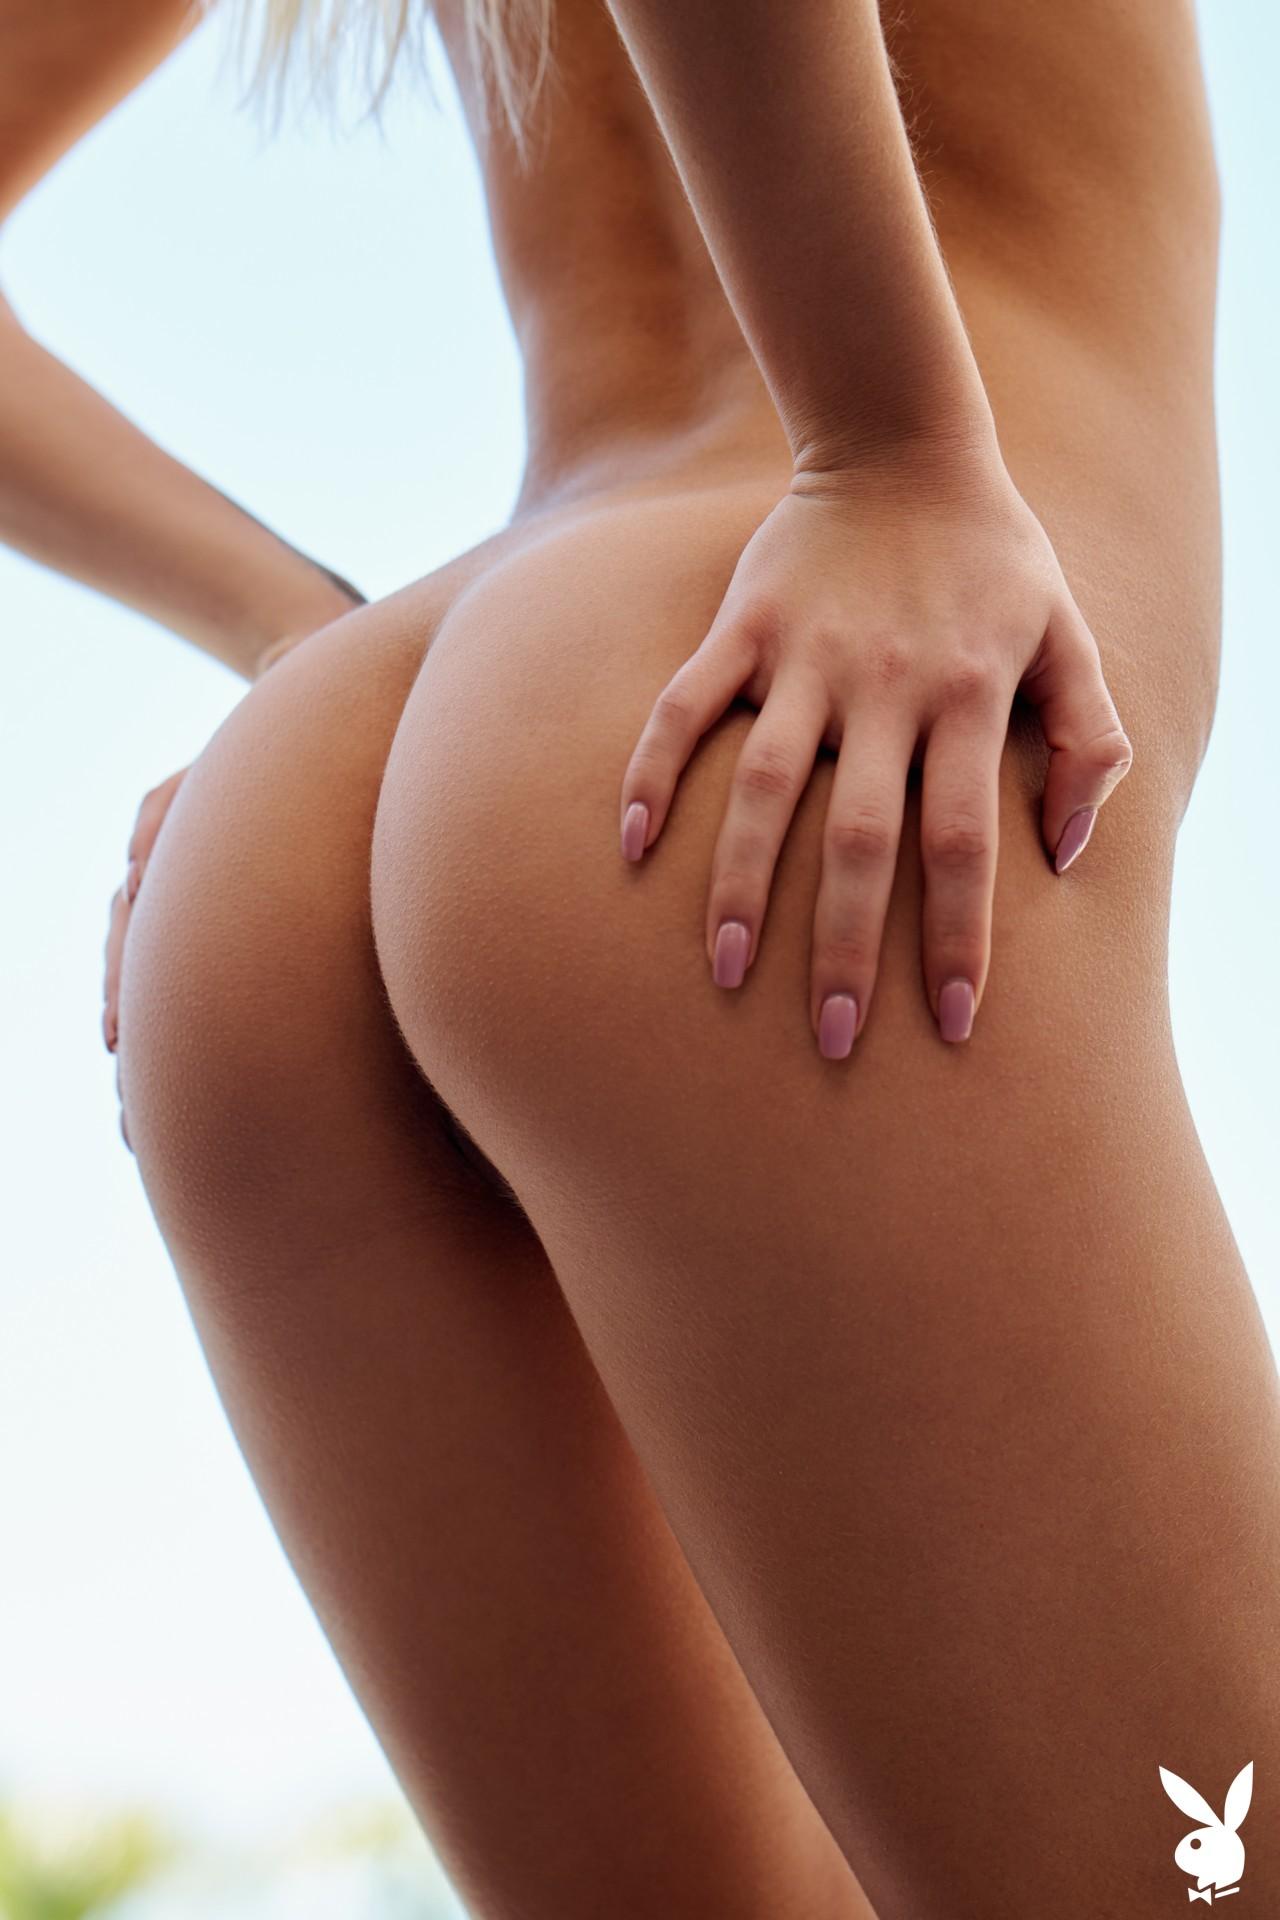 Margarita Gajewska In Playboy Germany Playboy Plus (11)